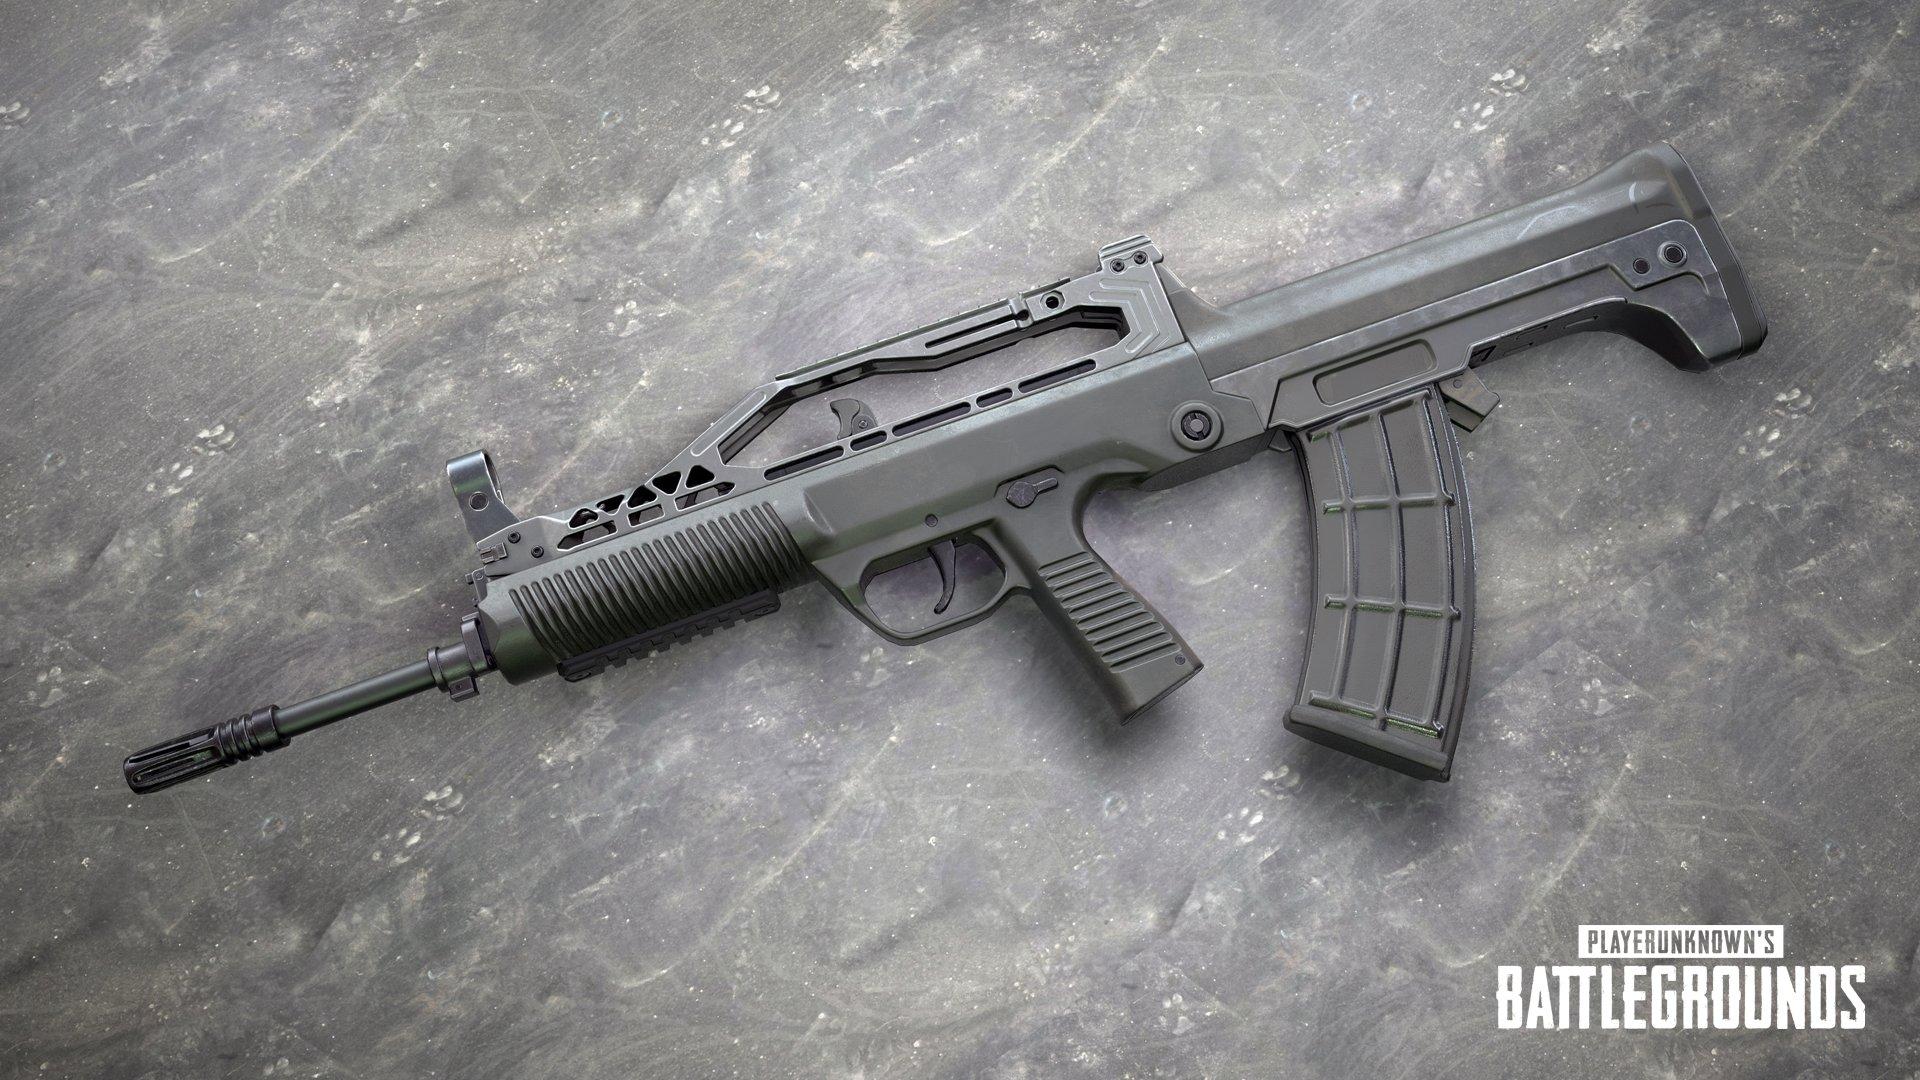 Sanhok-exklusives Assault Rifle: QBZ95